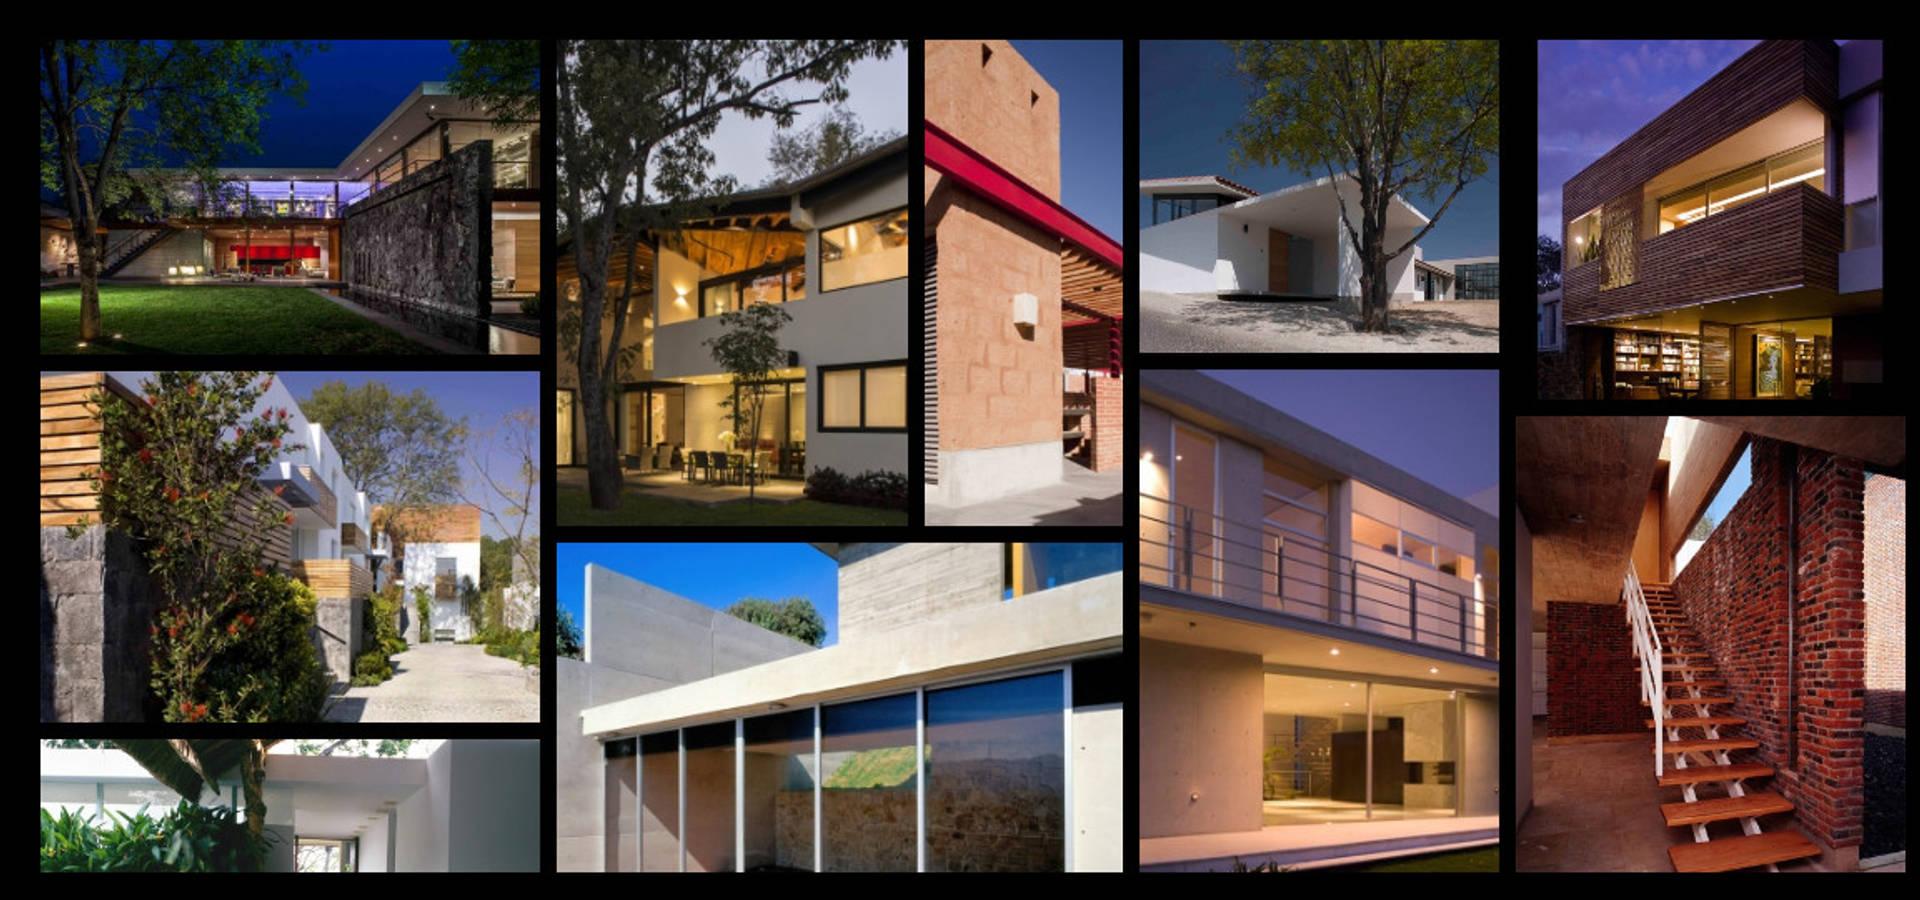 Alonso Chein Arquitectura